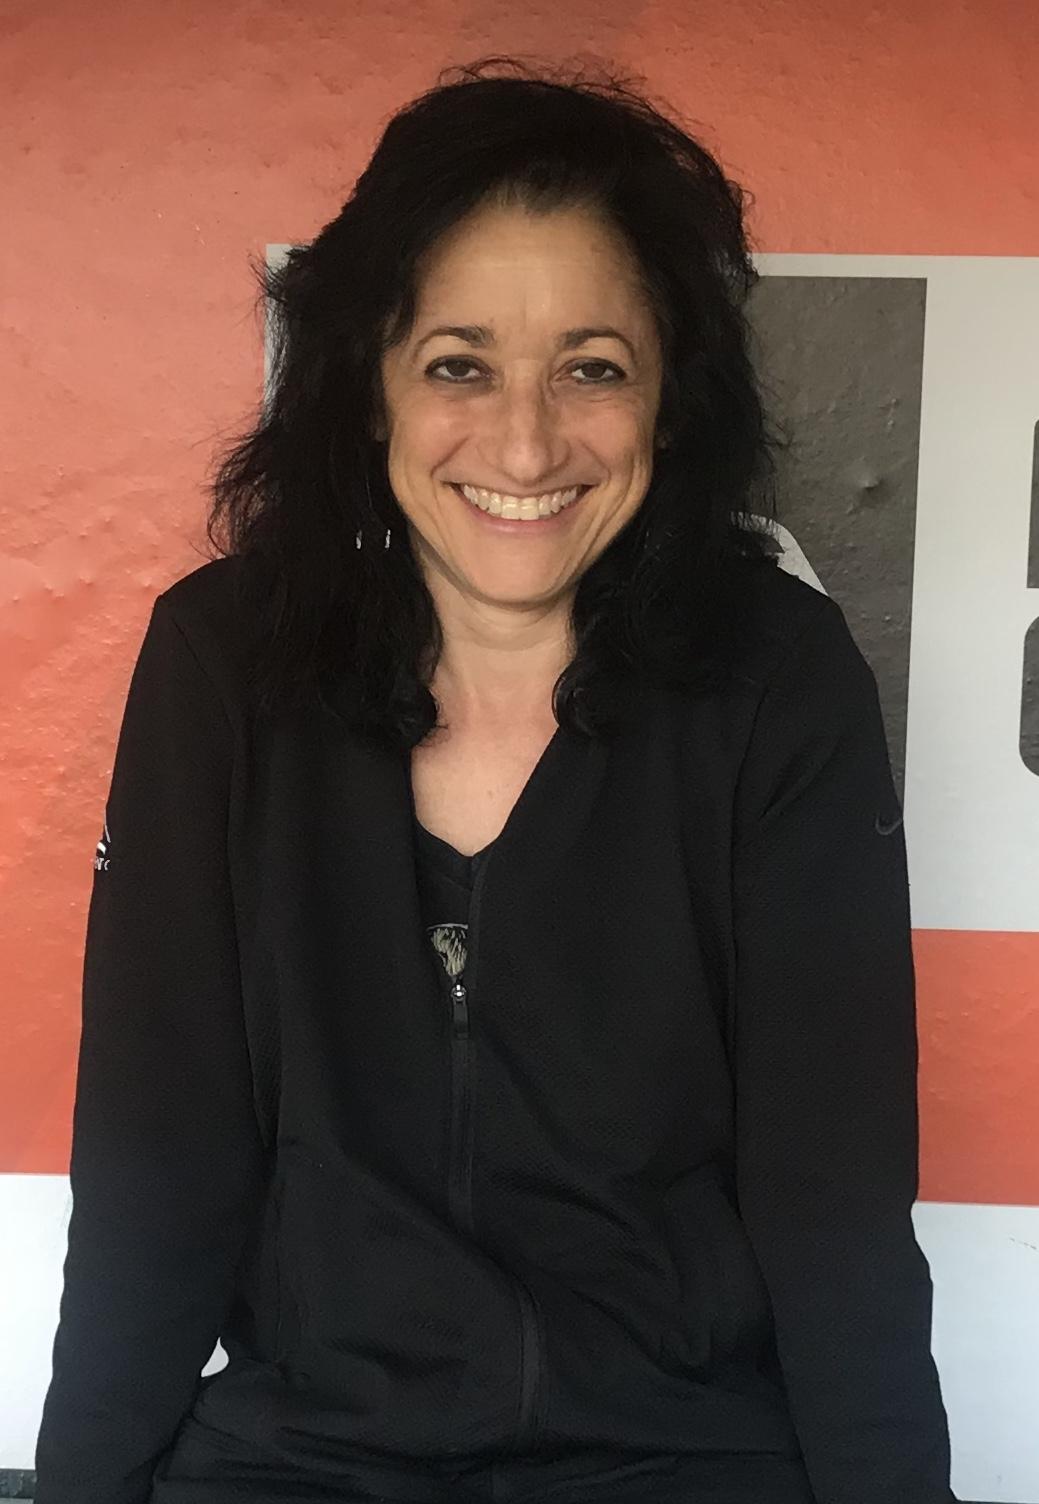 Marlene Goldman, CA, USA